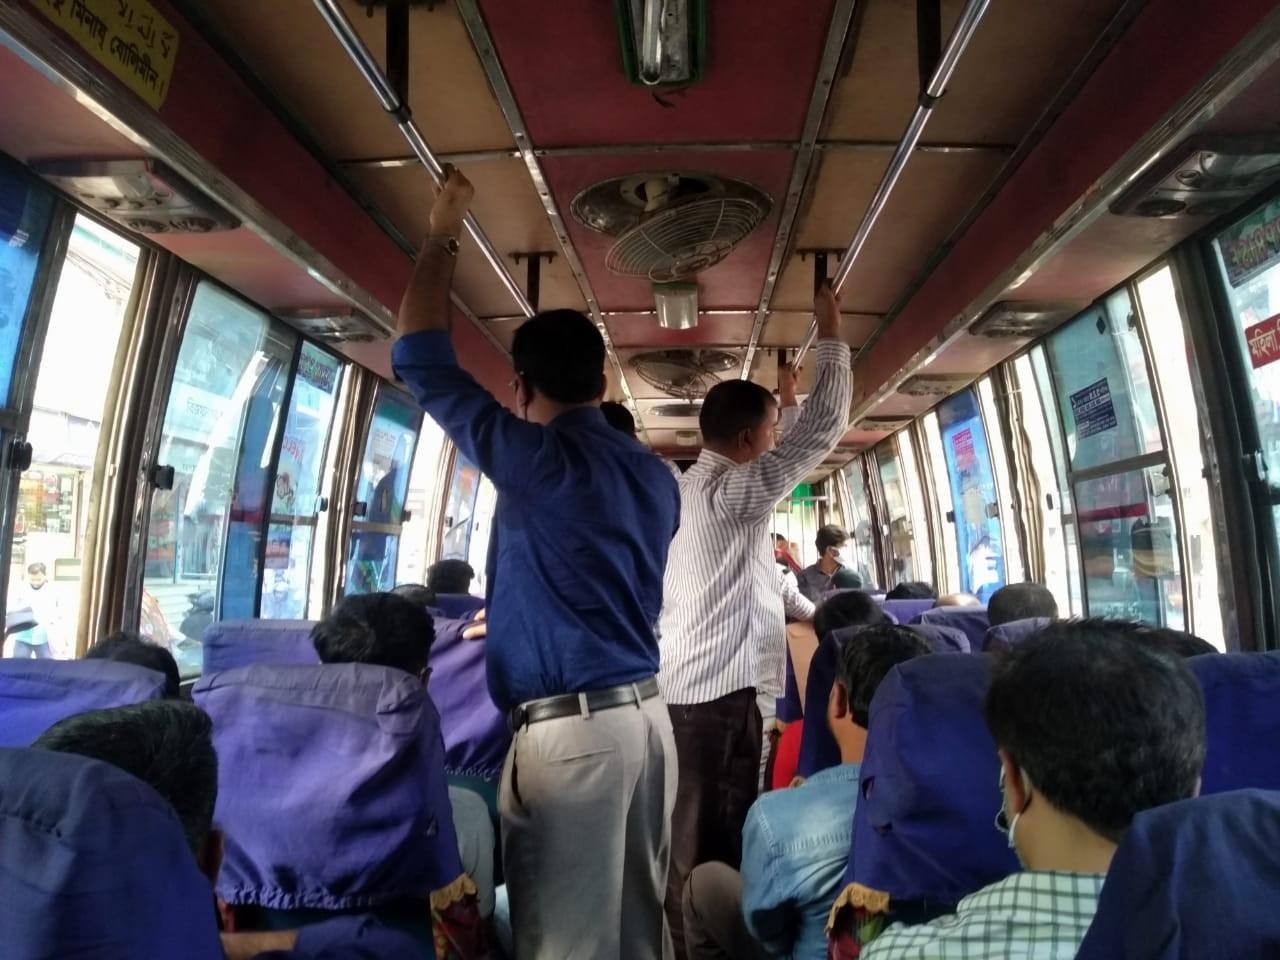 Coronavirus: Public transport to be shut from March 26